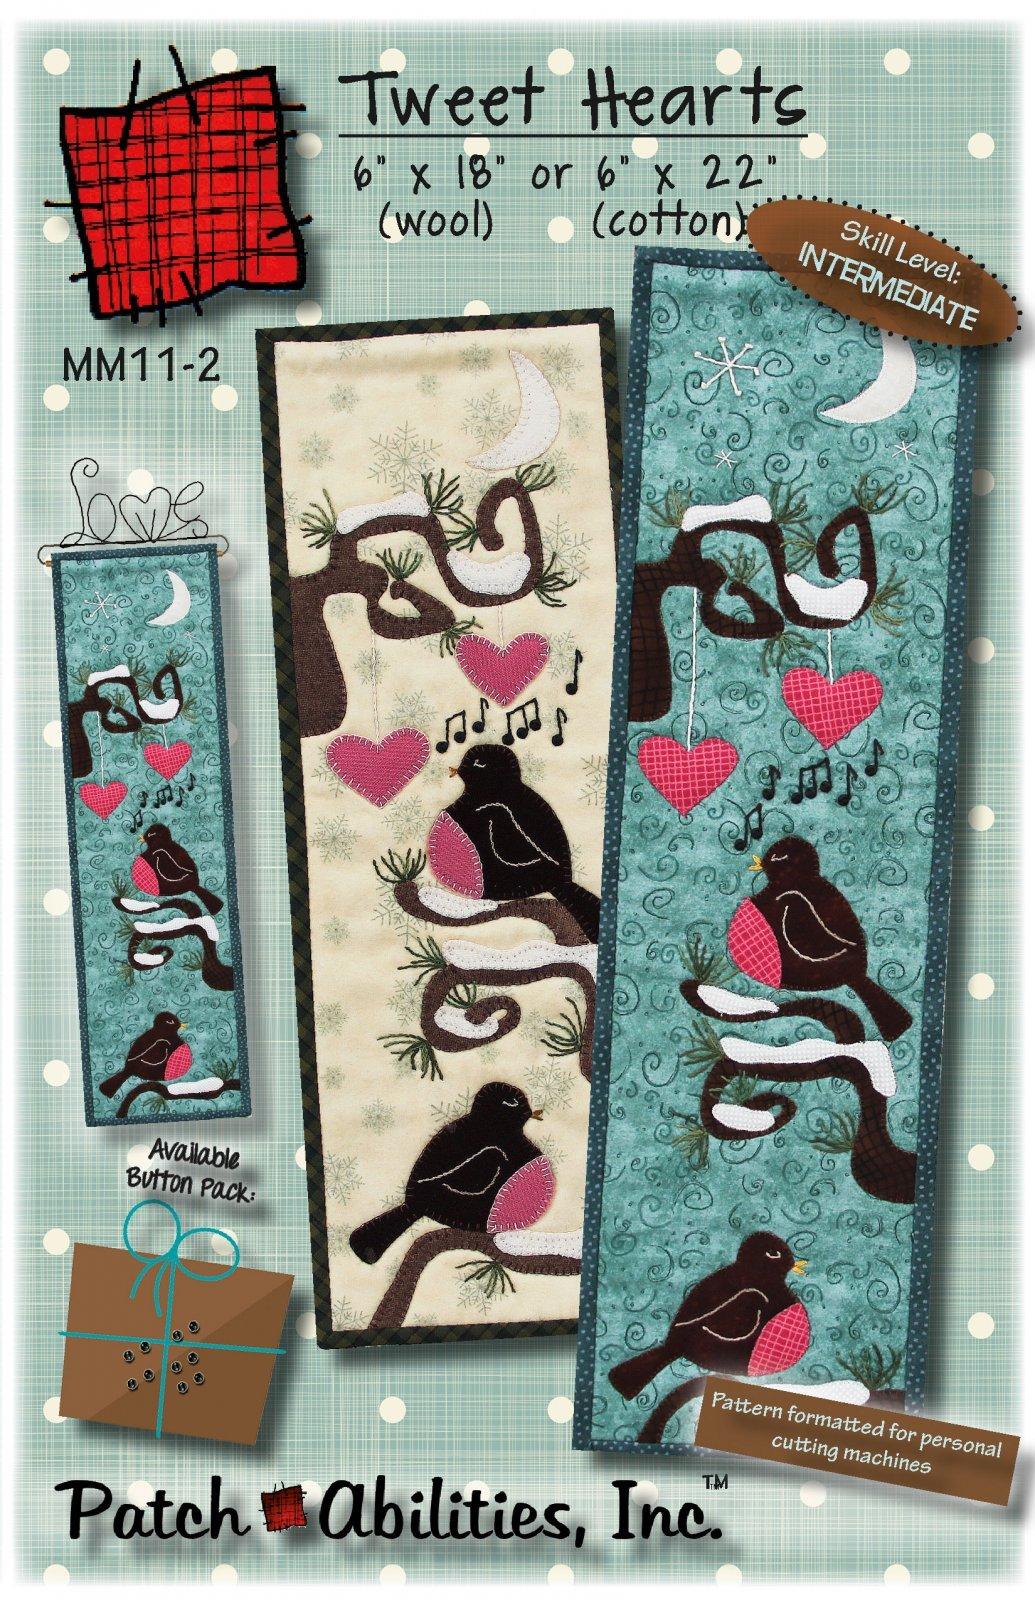 Tweet Hearts wool kit - 28.00